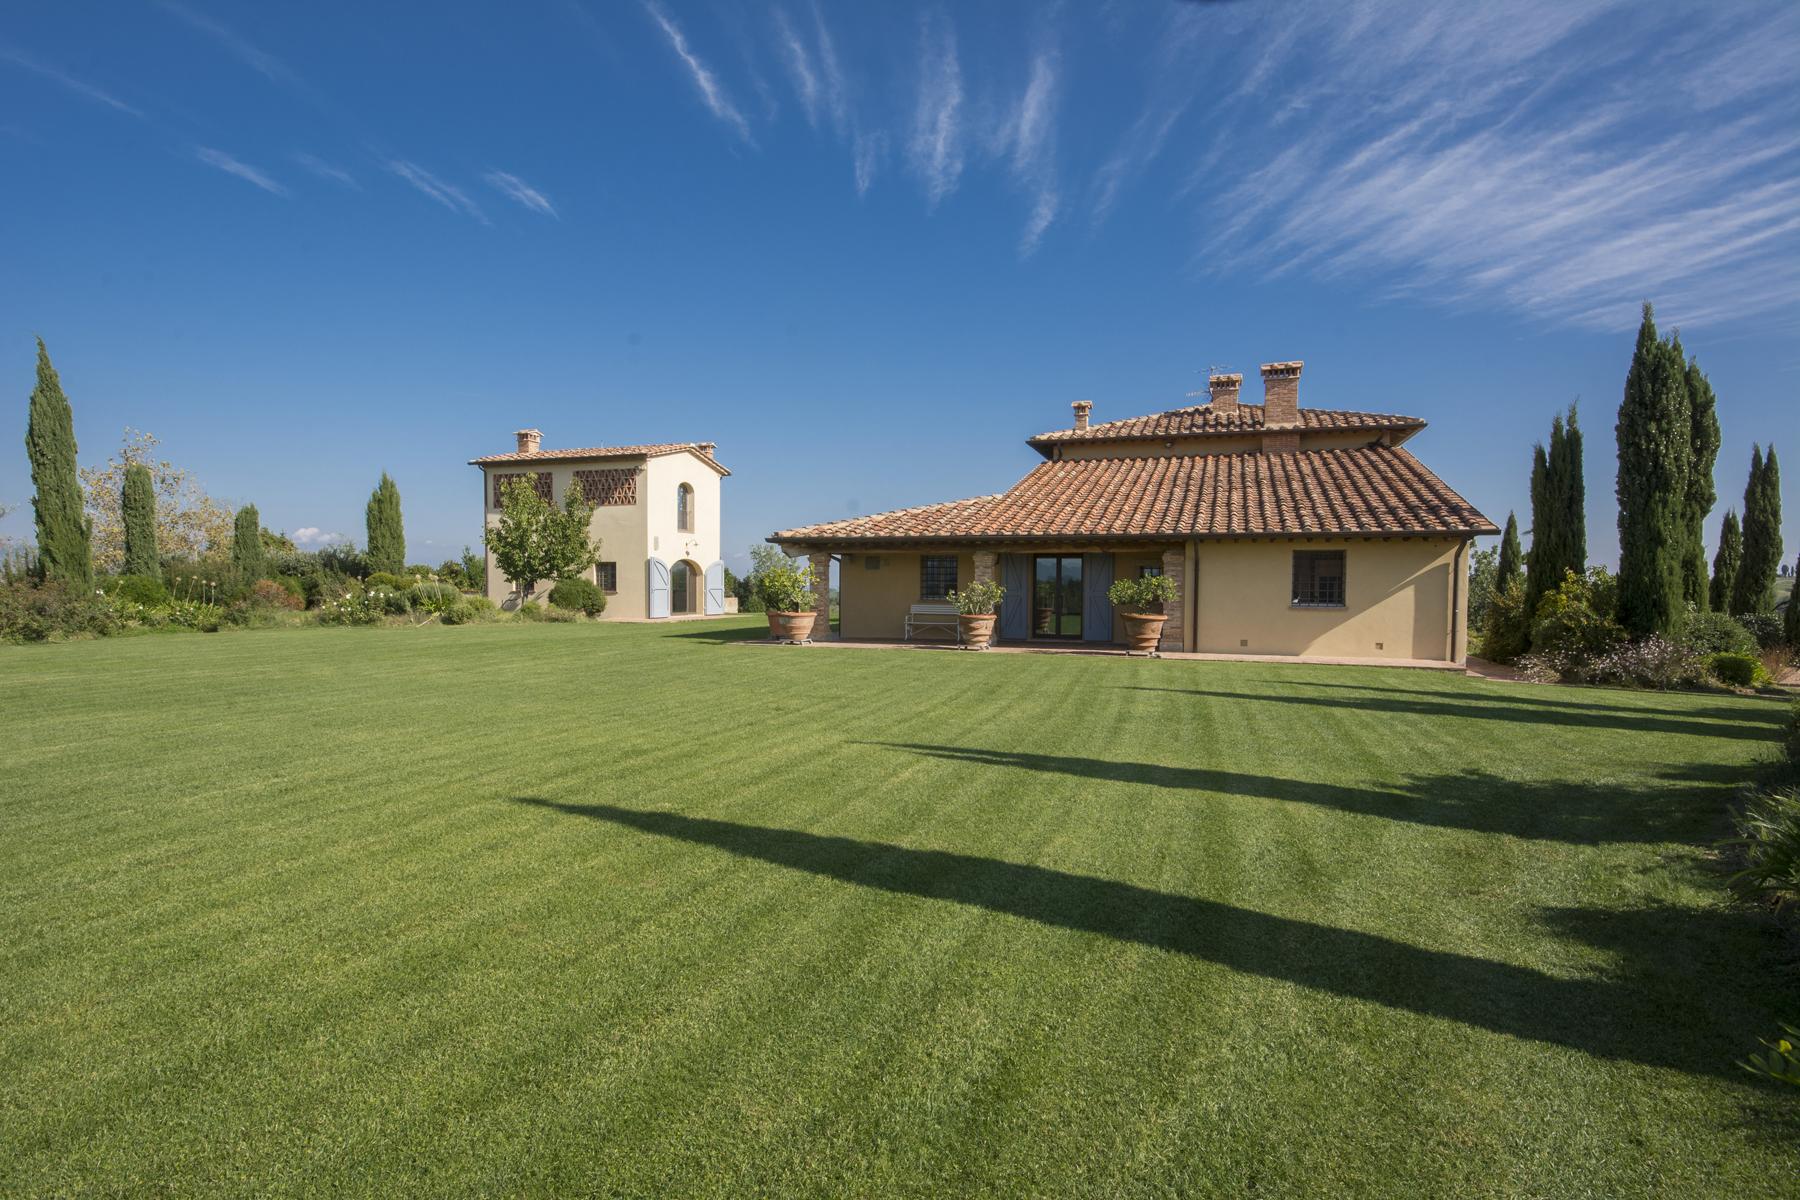 Superbe villa dans la campagne Toscane